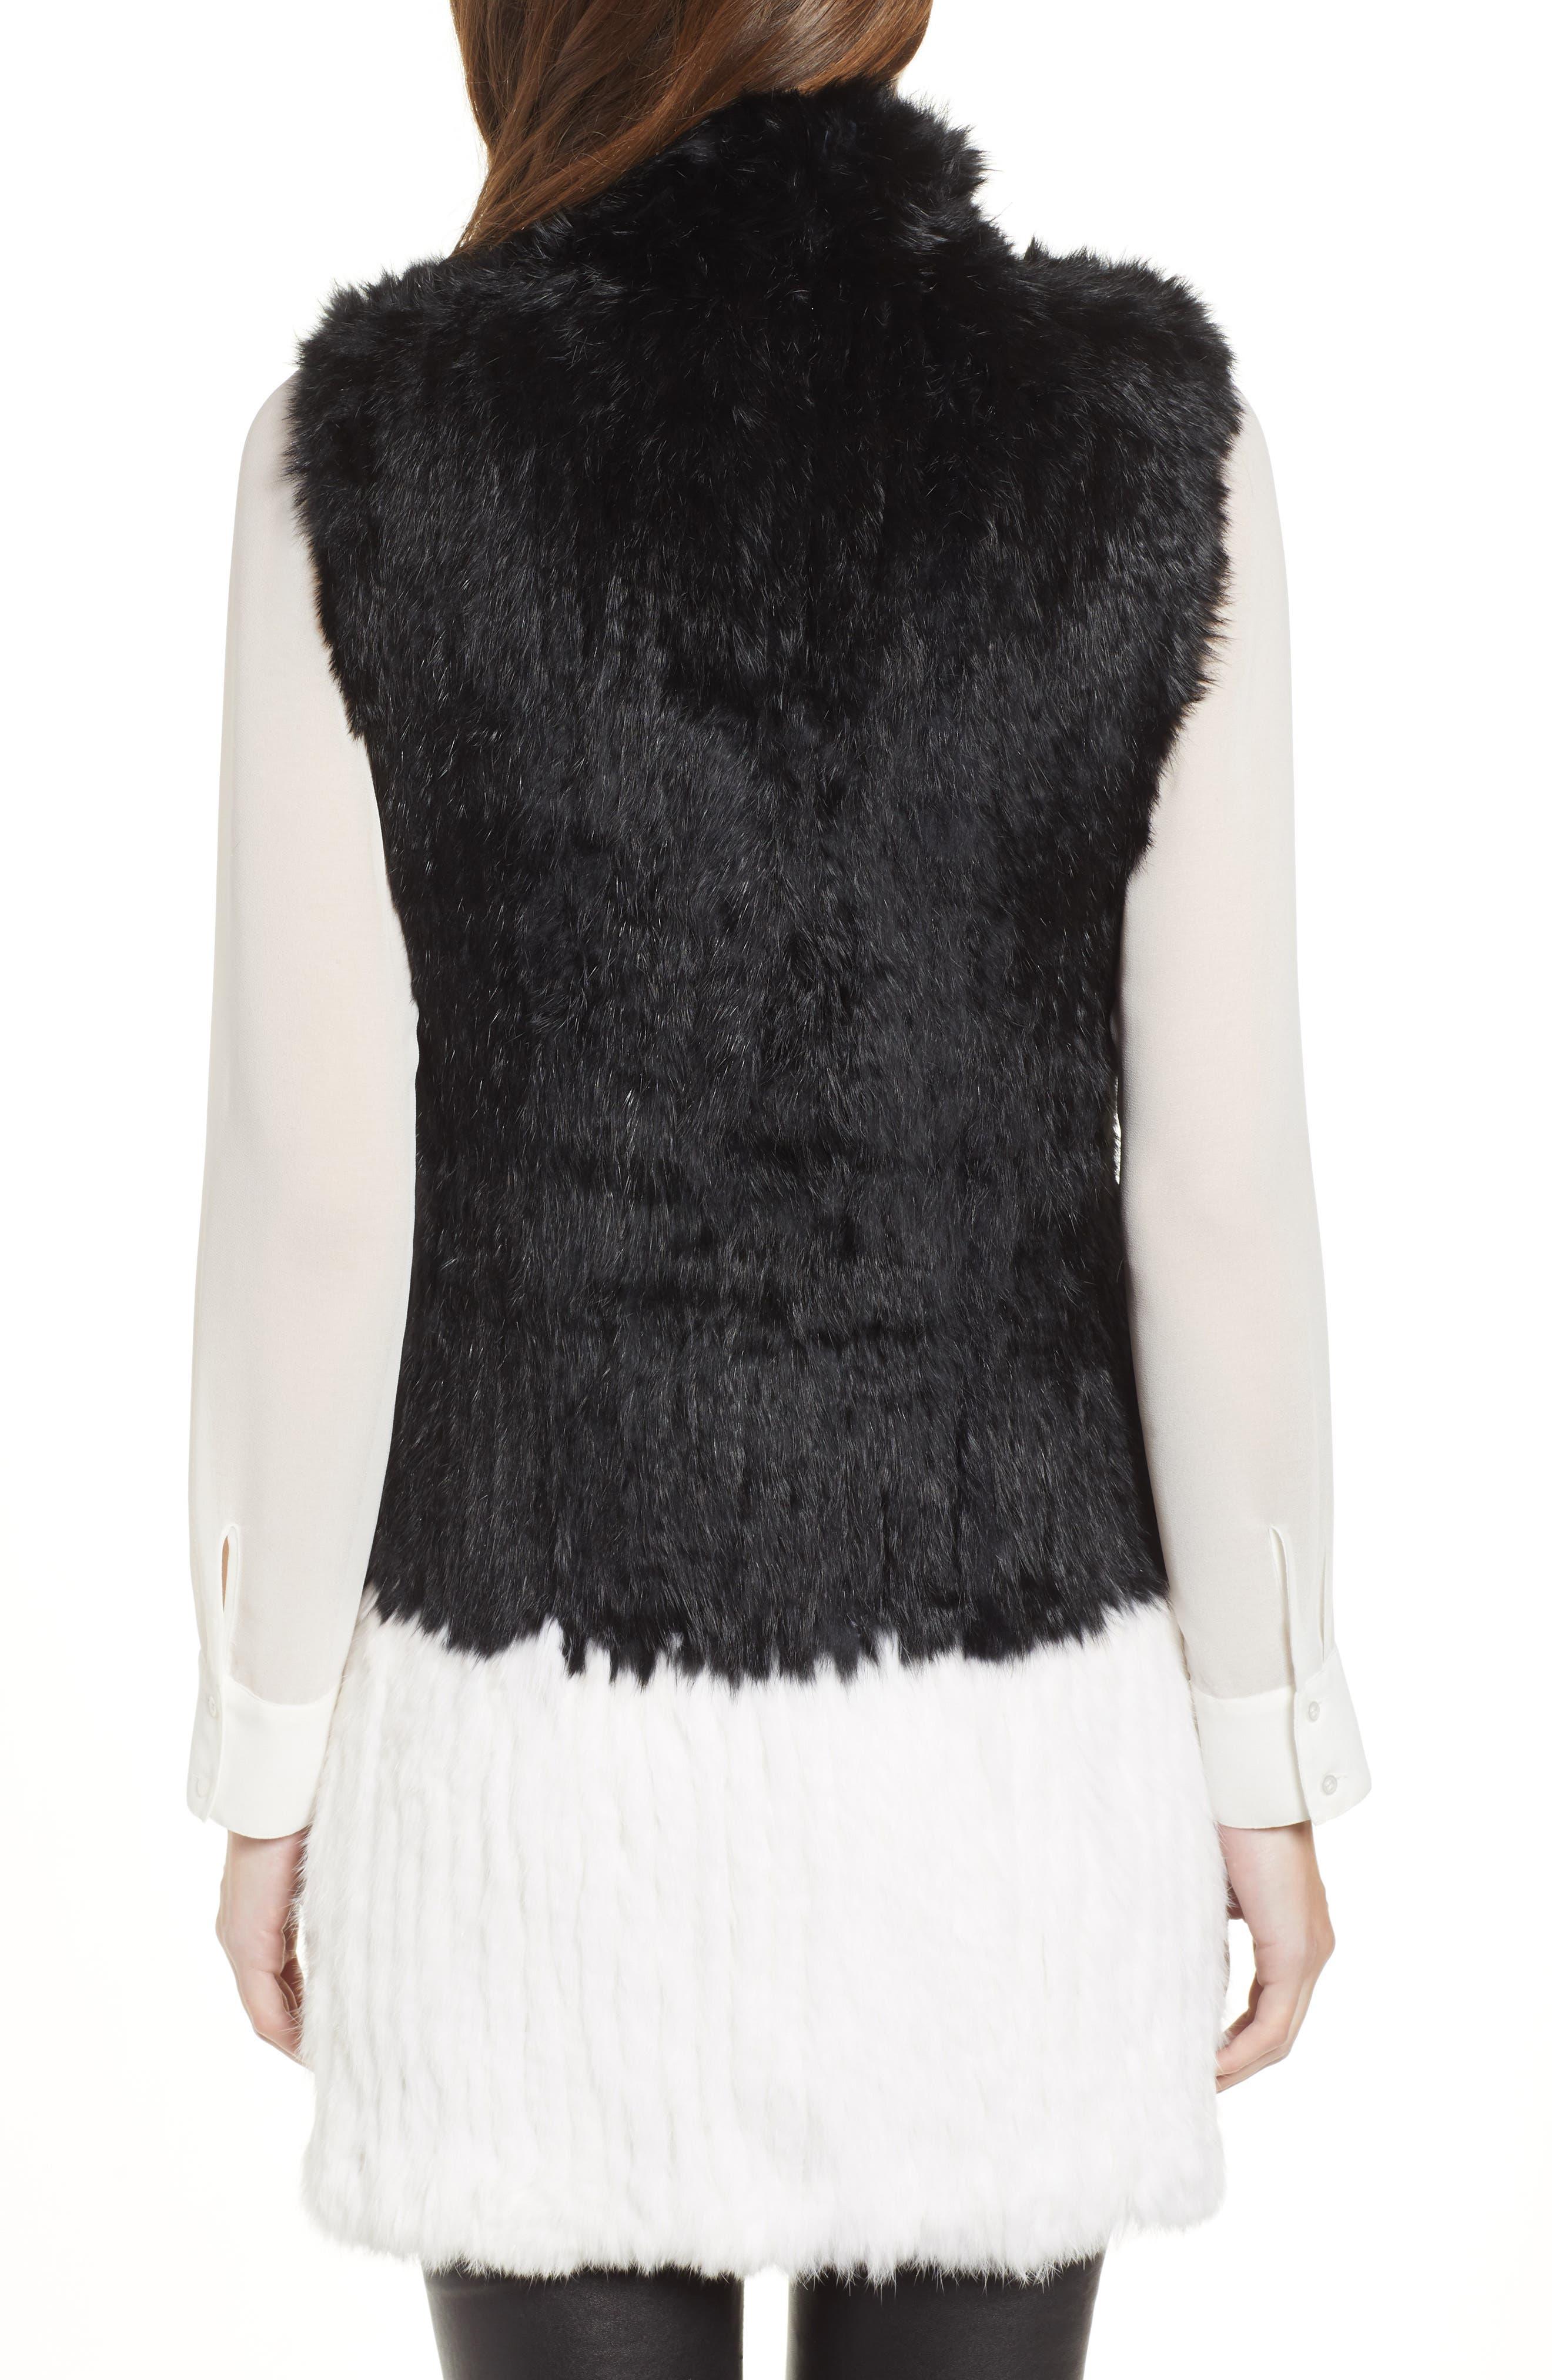 LOVE TOKEN, Long Colorblock Genuine Rabbit Fur Vest, Alternate thumbnail 2, color, 001